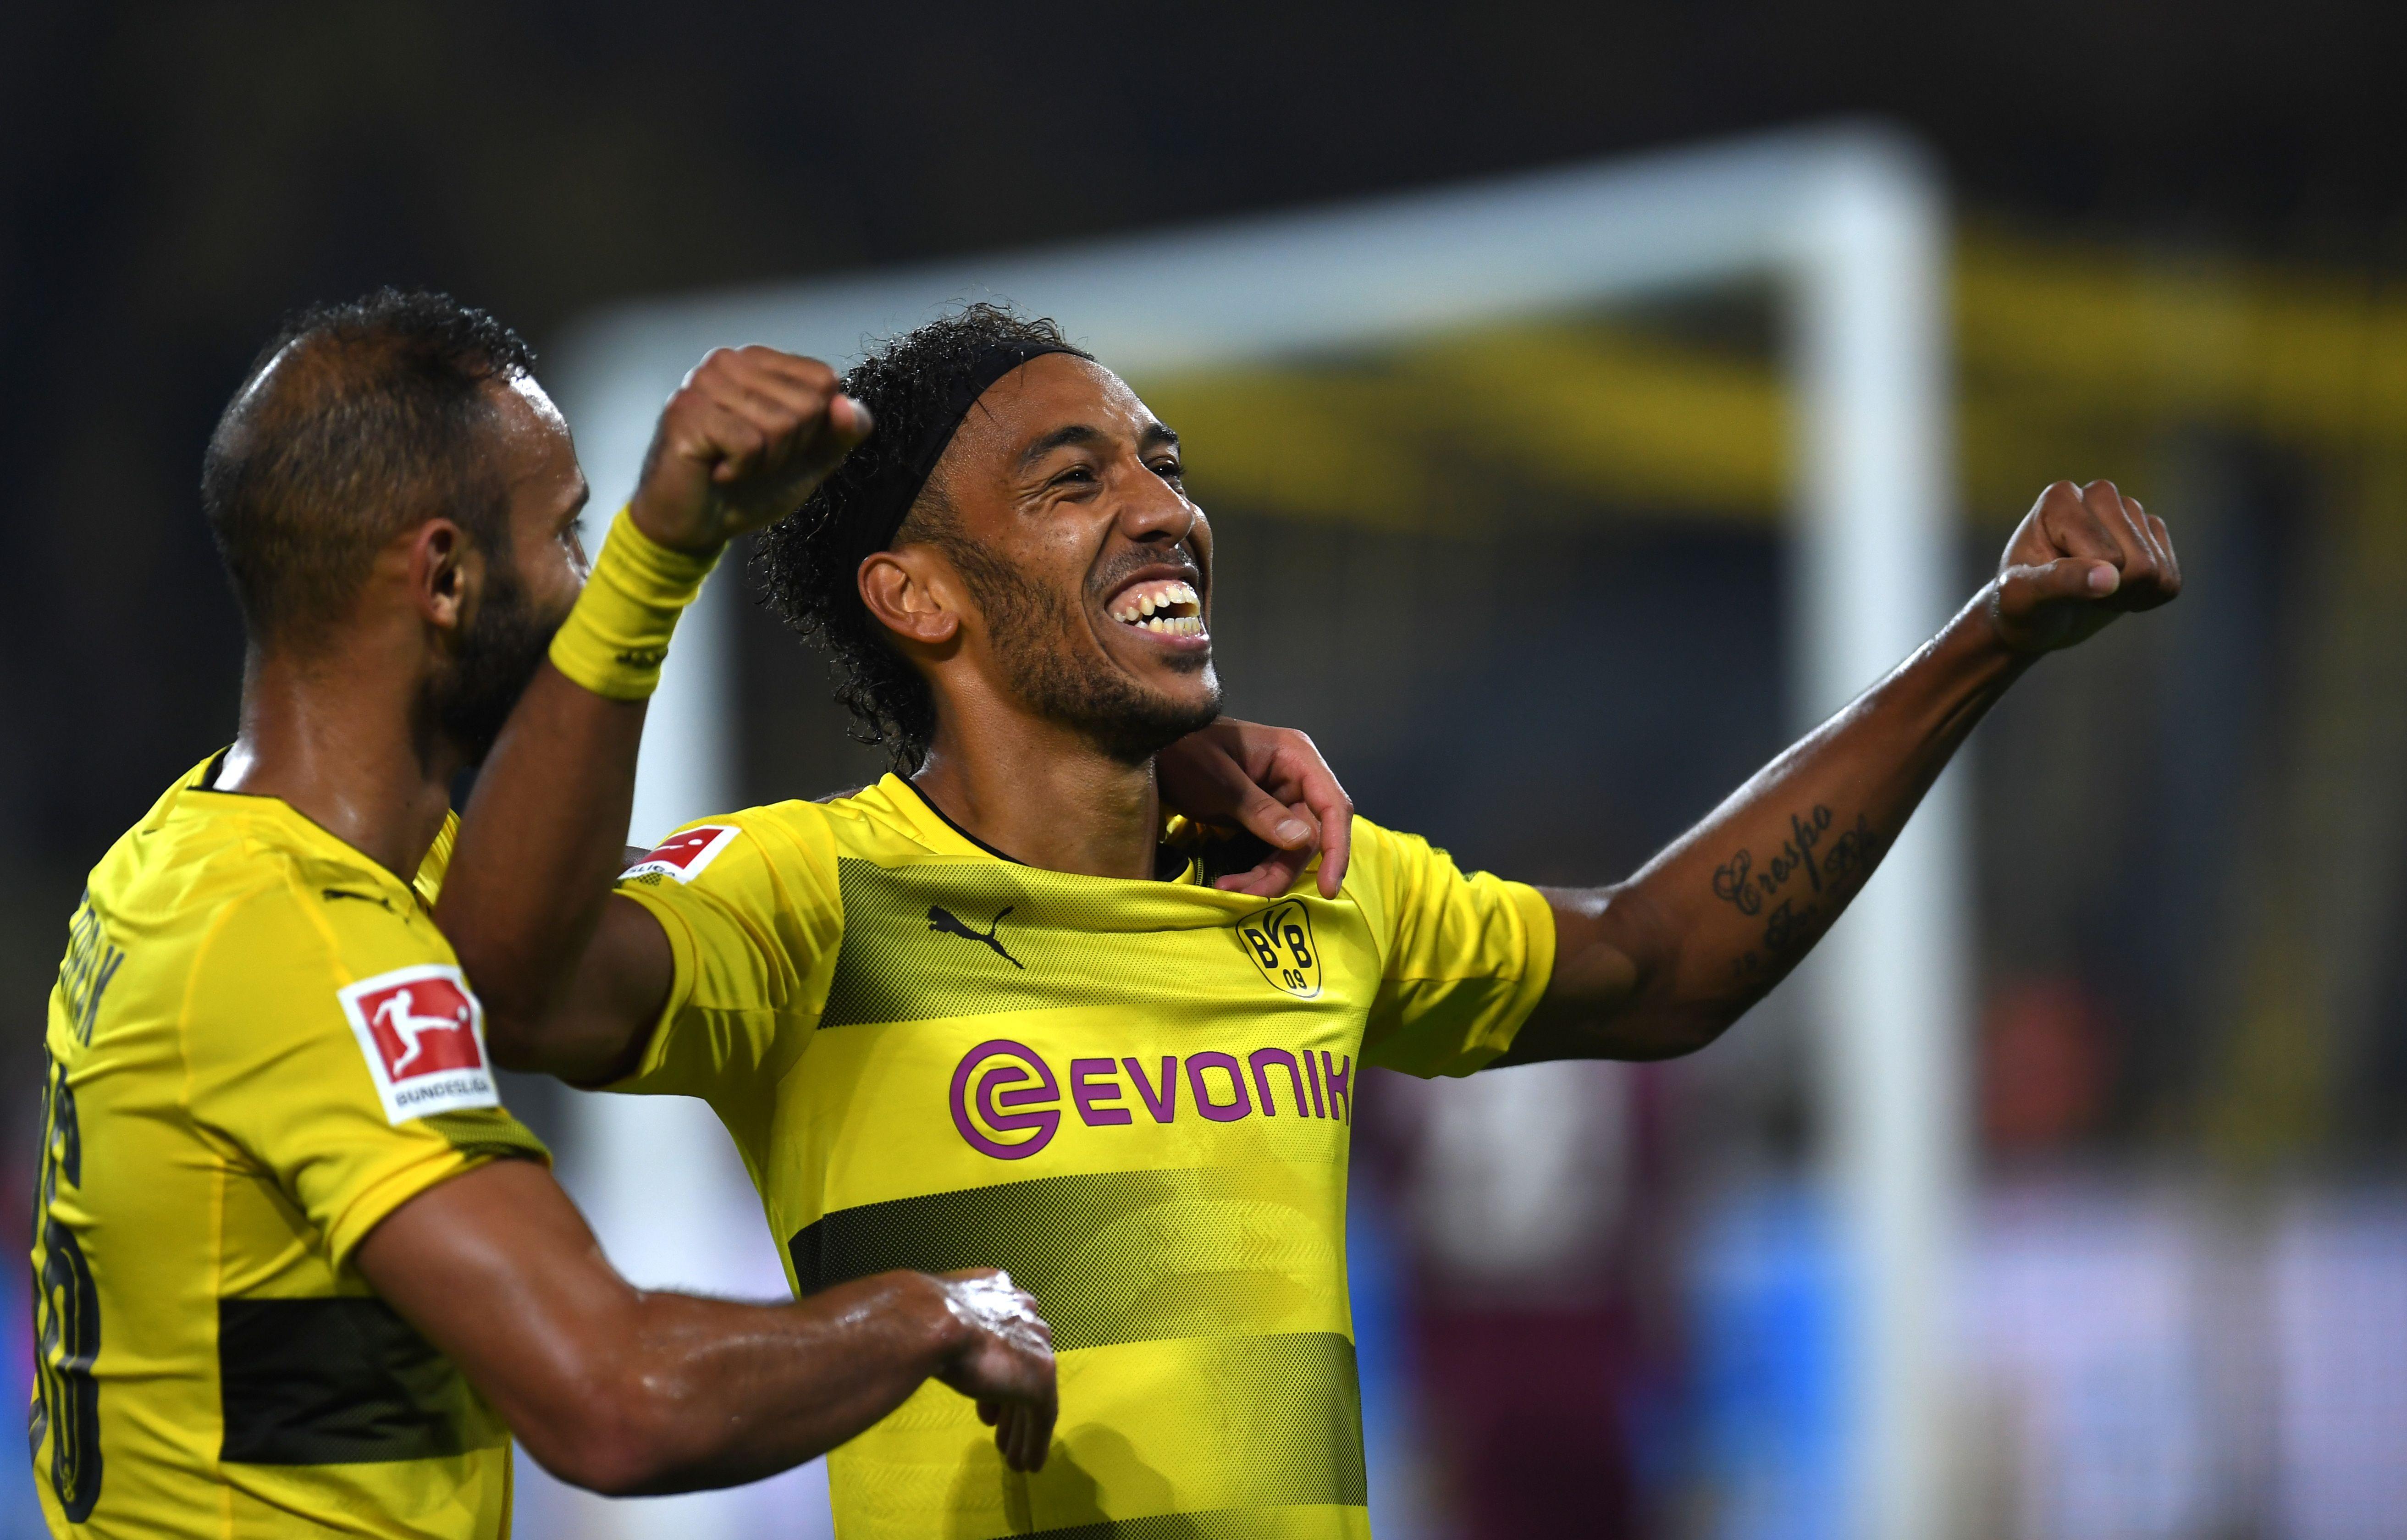 Football - Etranger - Dortmund chauffe son stade à blanc avant de recevoir le Real